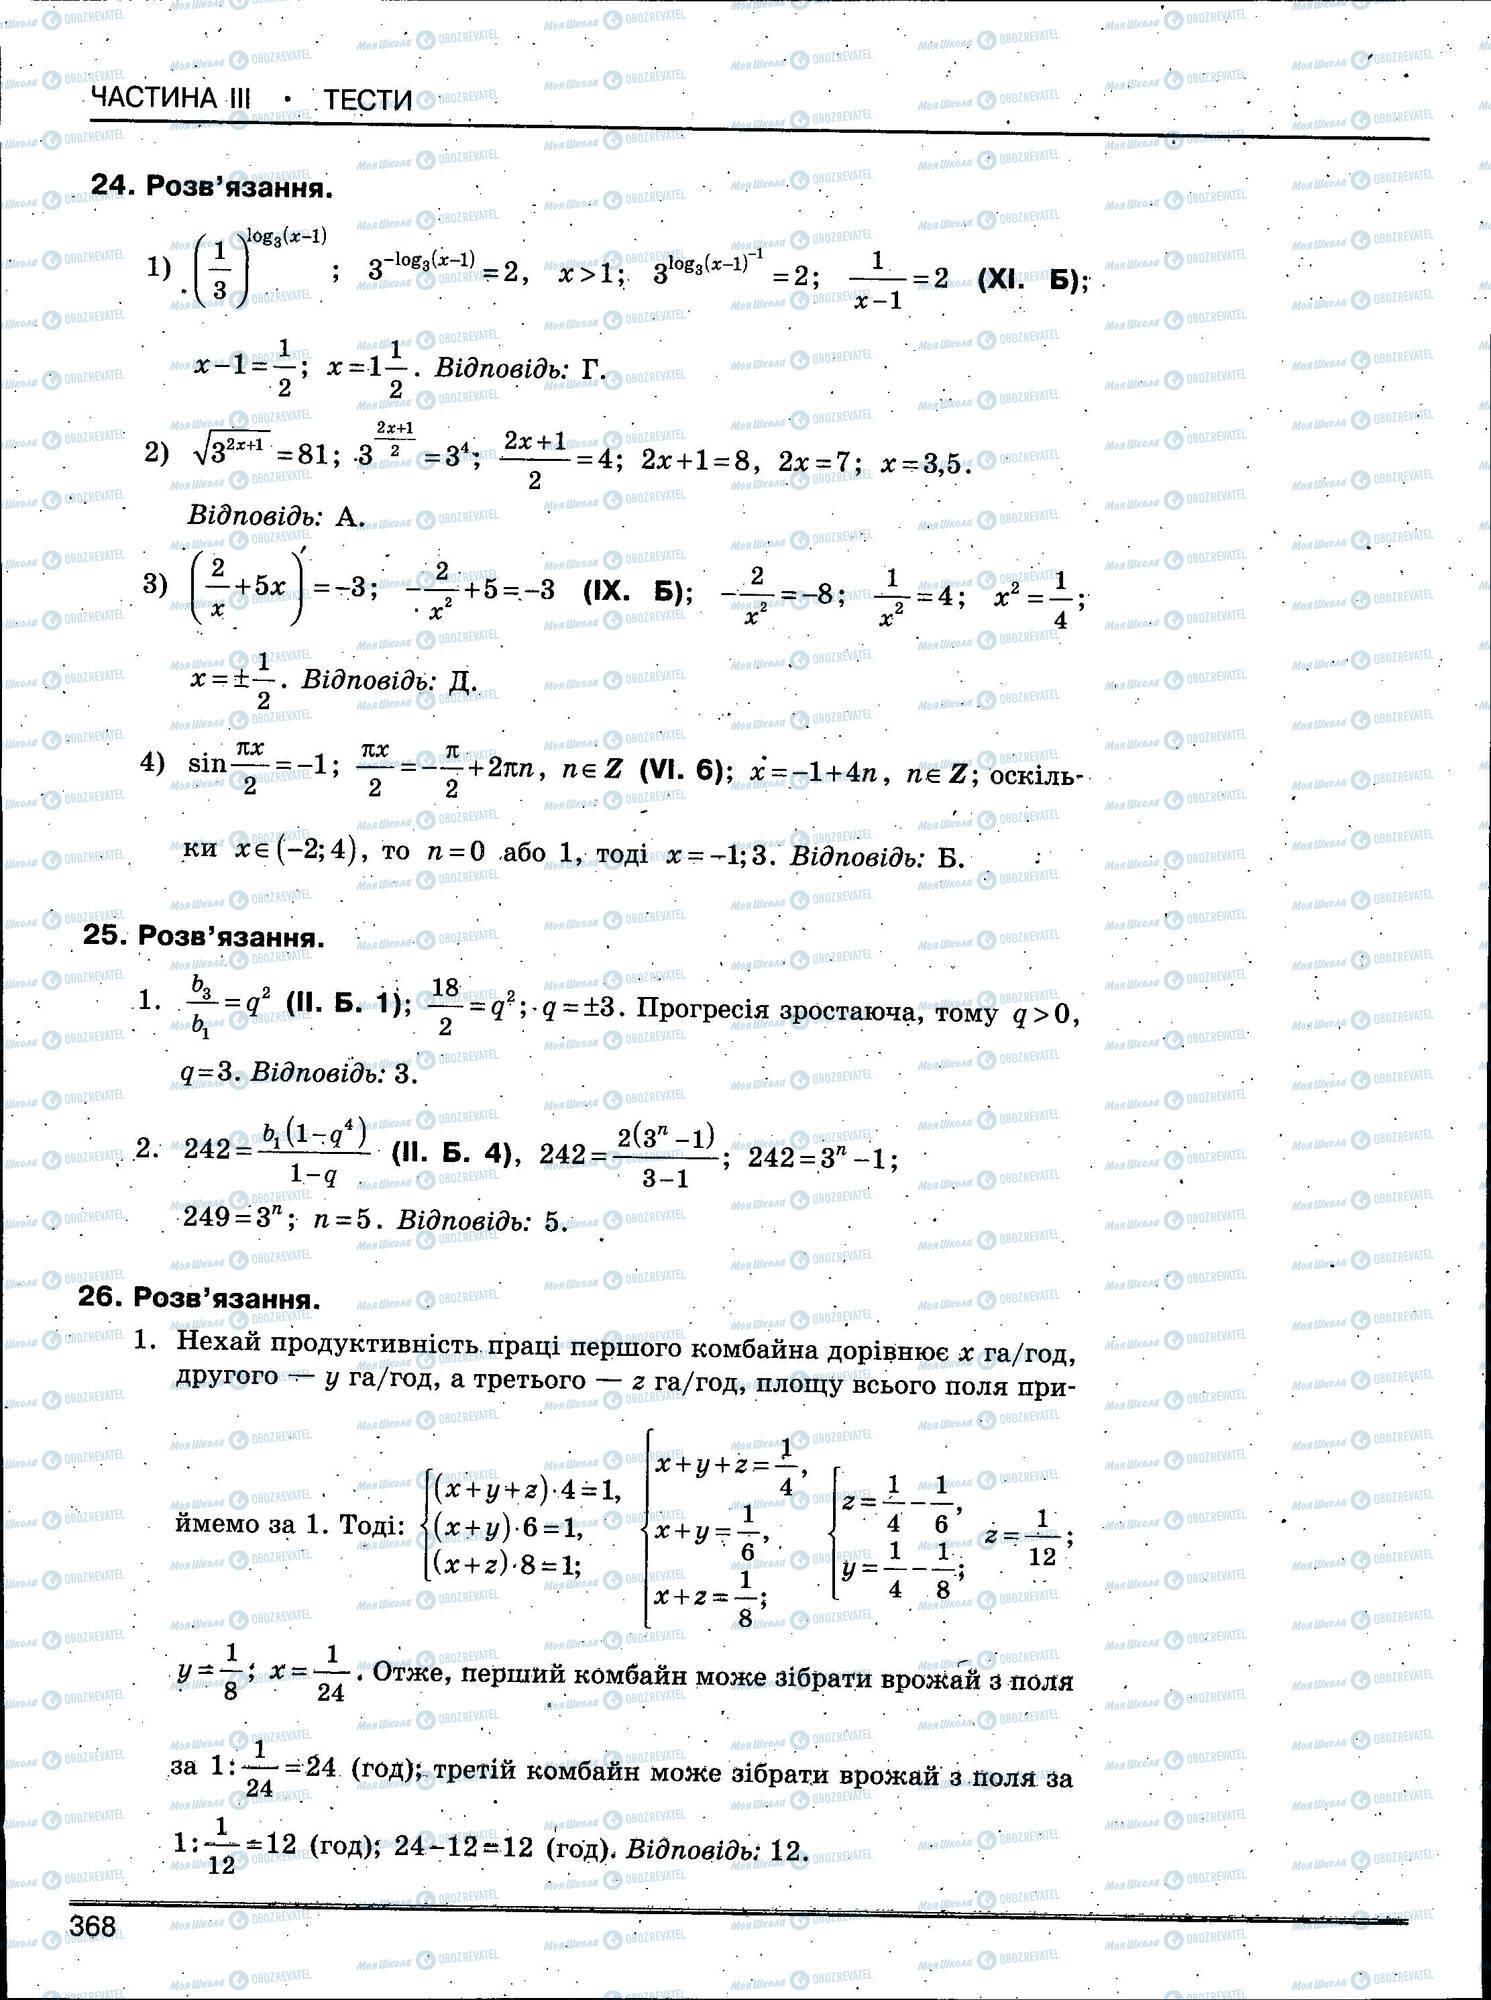 ЗНО Математика 11 класс страница 368